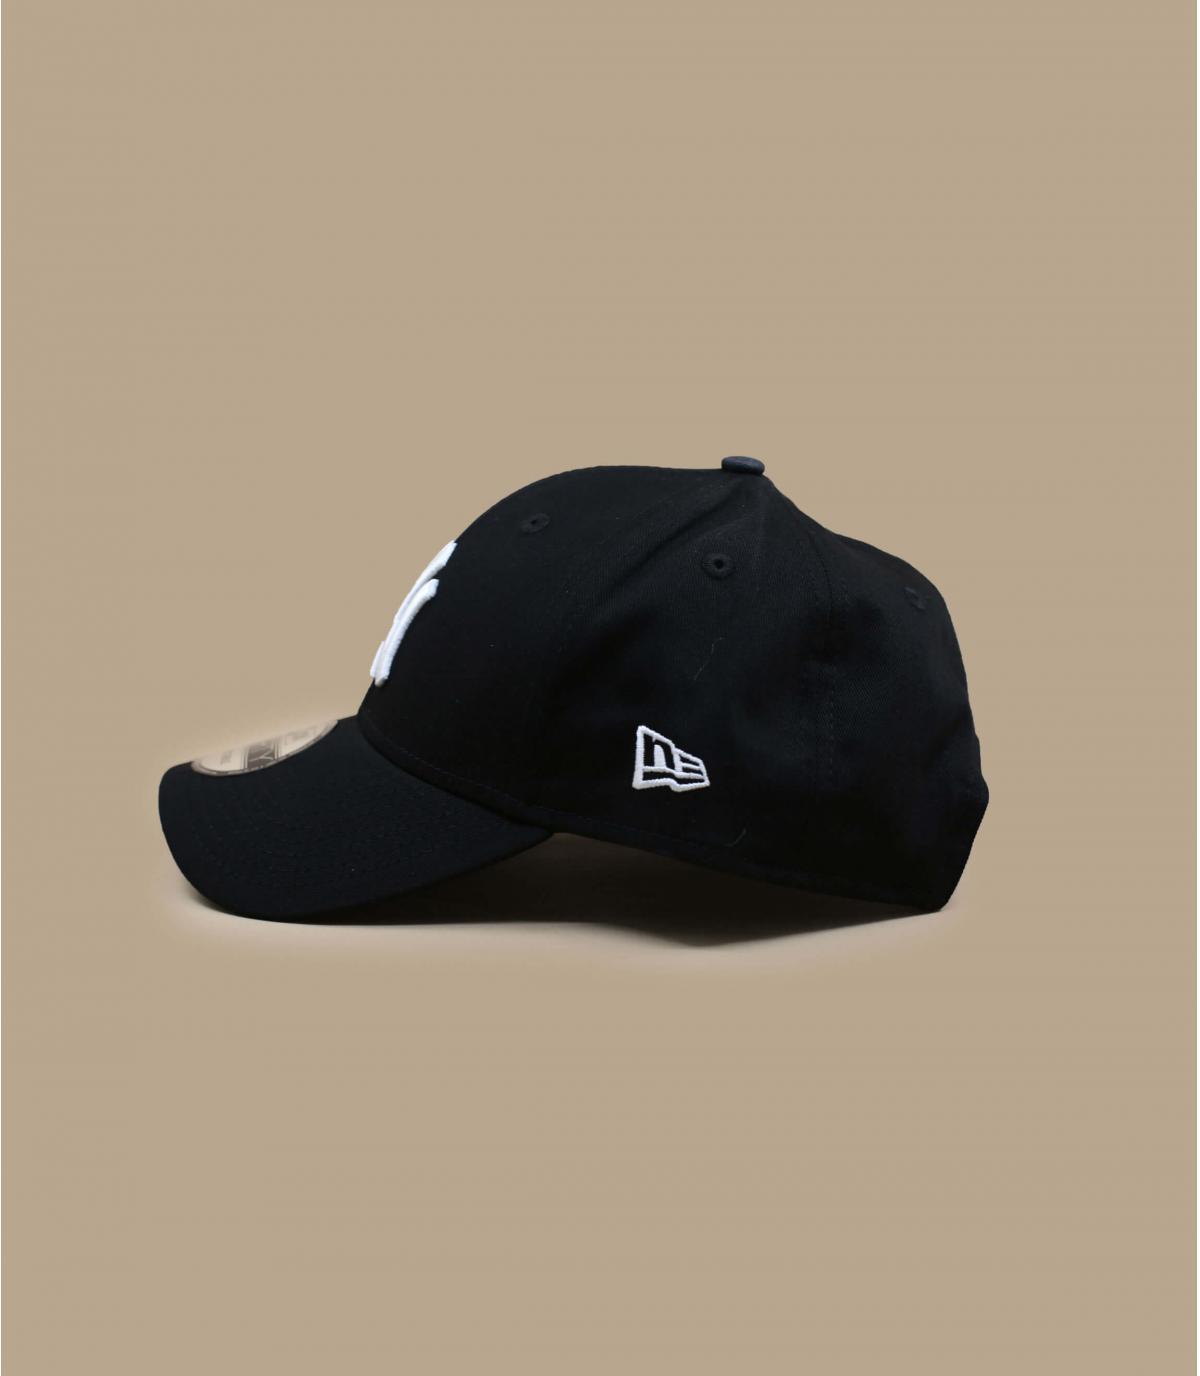 Dettagli League Ess NY 9Forty black white - image 2